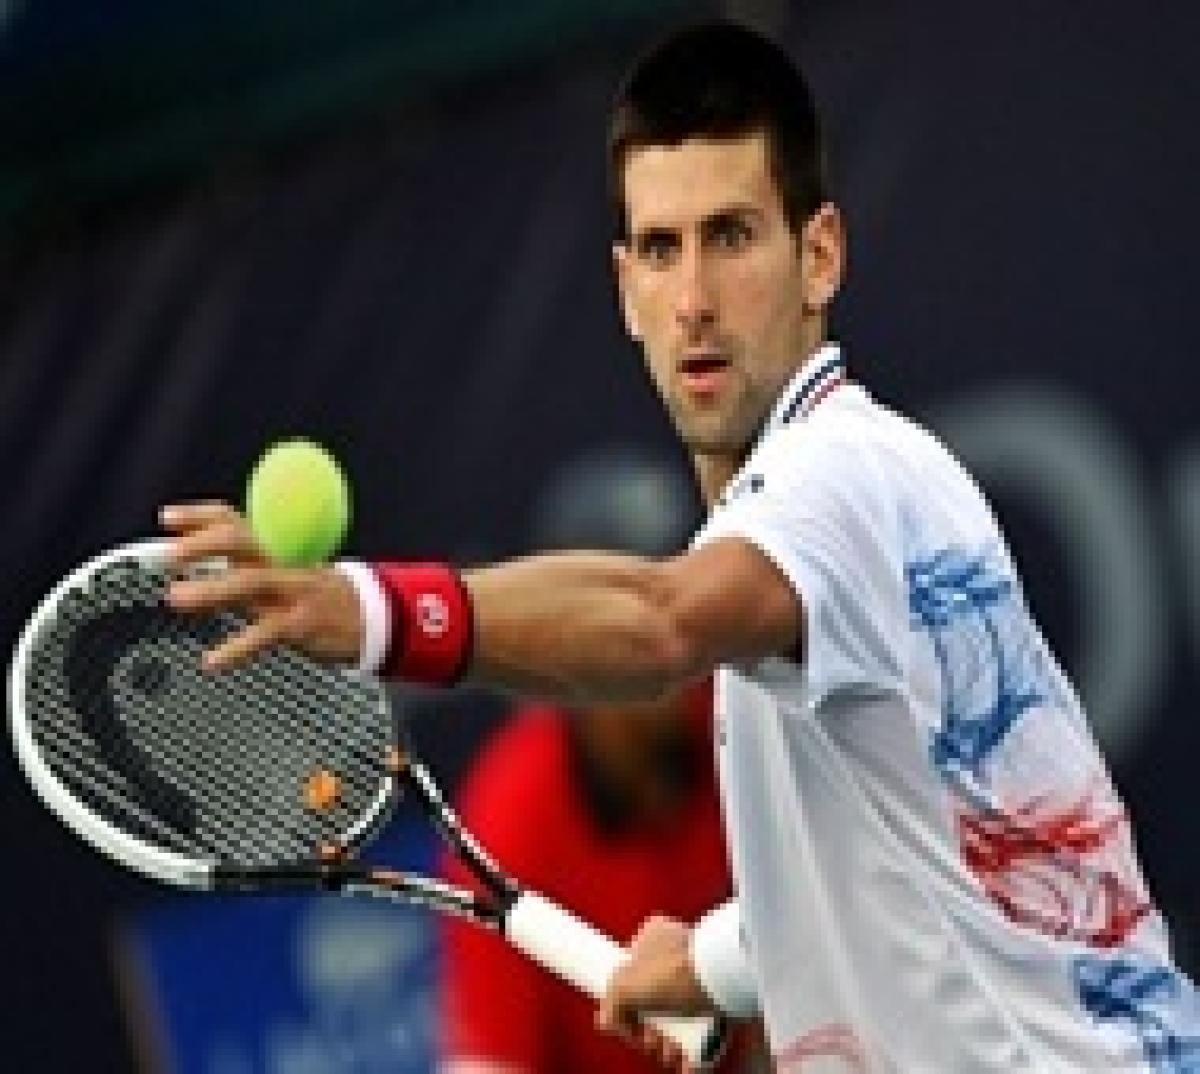 Djokovic sets up semifinal showdown with Nishikori in Madrid